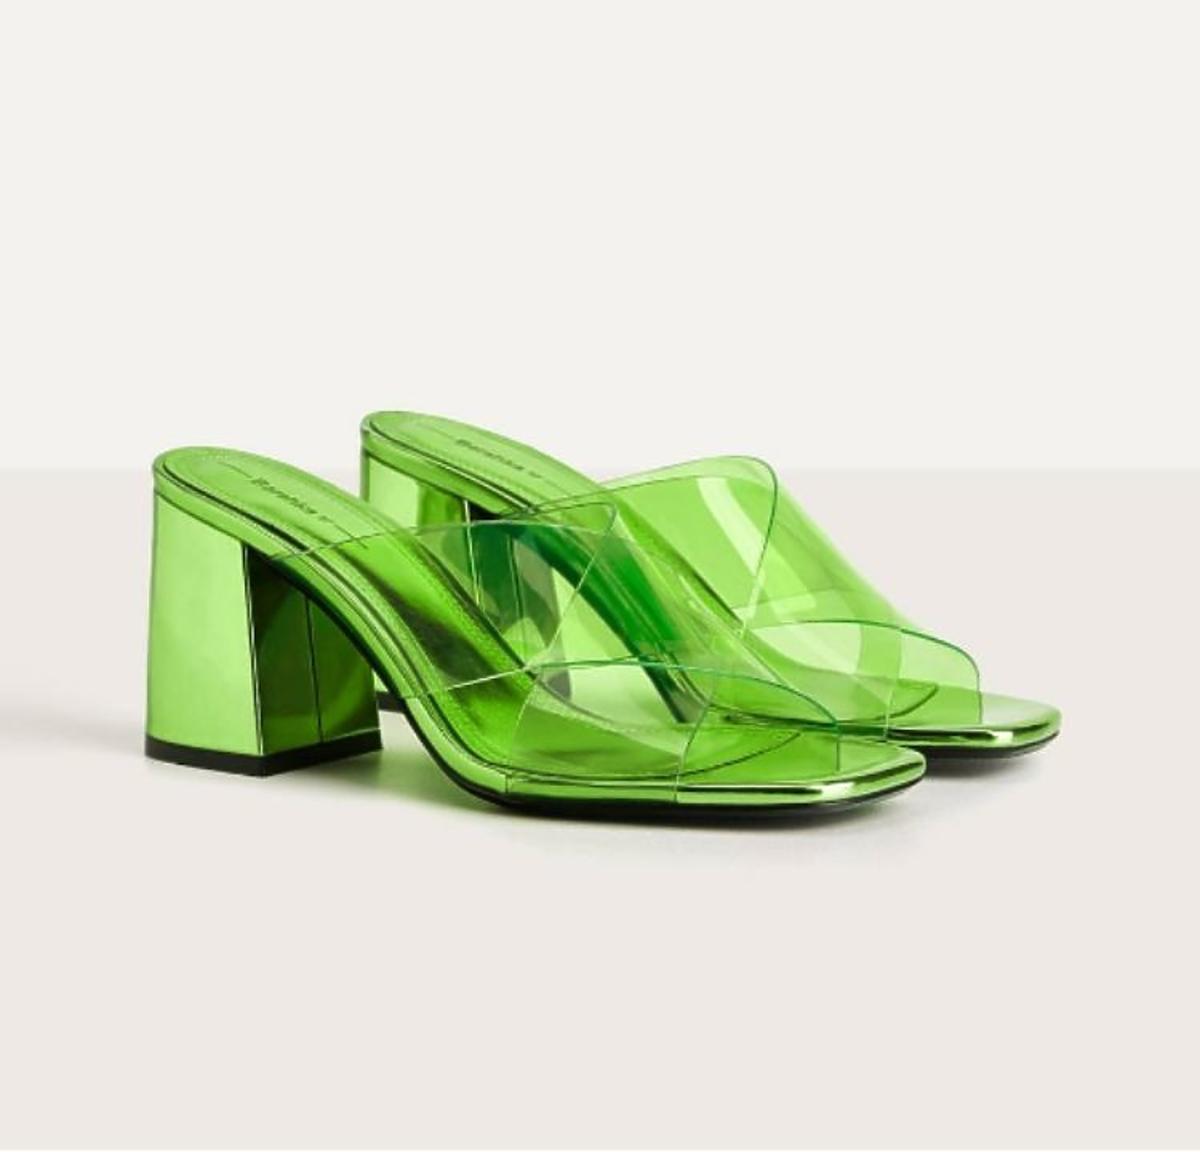 Zielone klapki Bershka